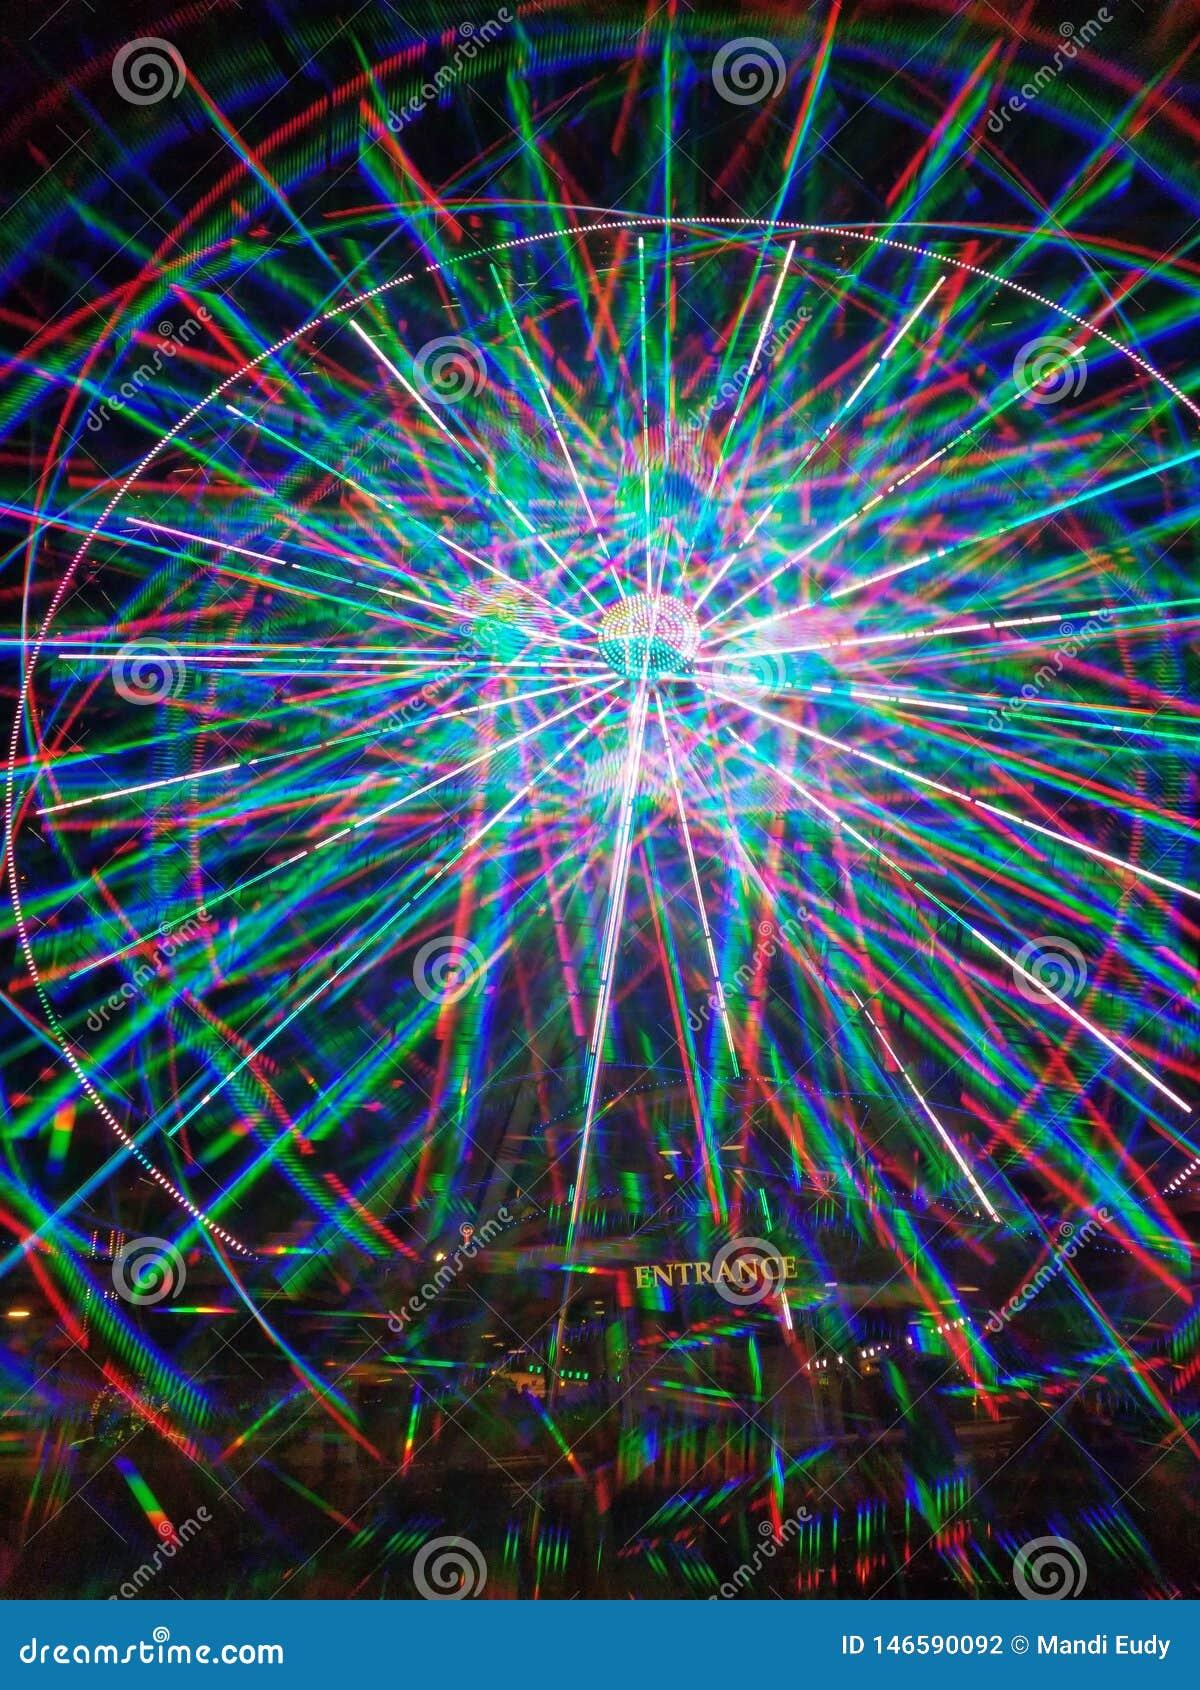 3D多彩多姿的光LED蓝色逃出克隆岛皮容福格弗累斯大转轮